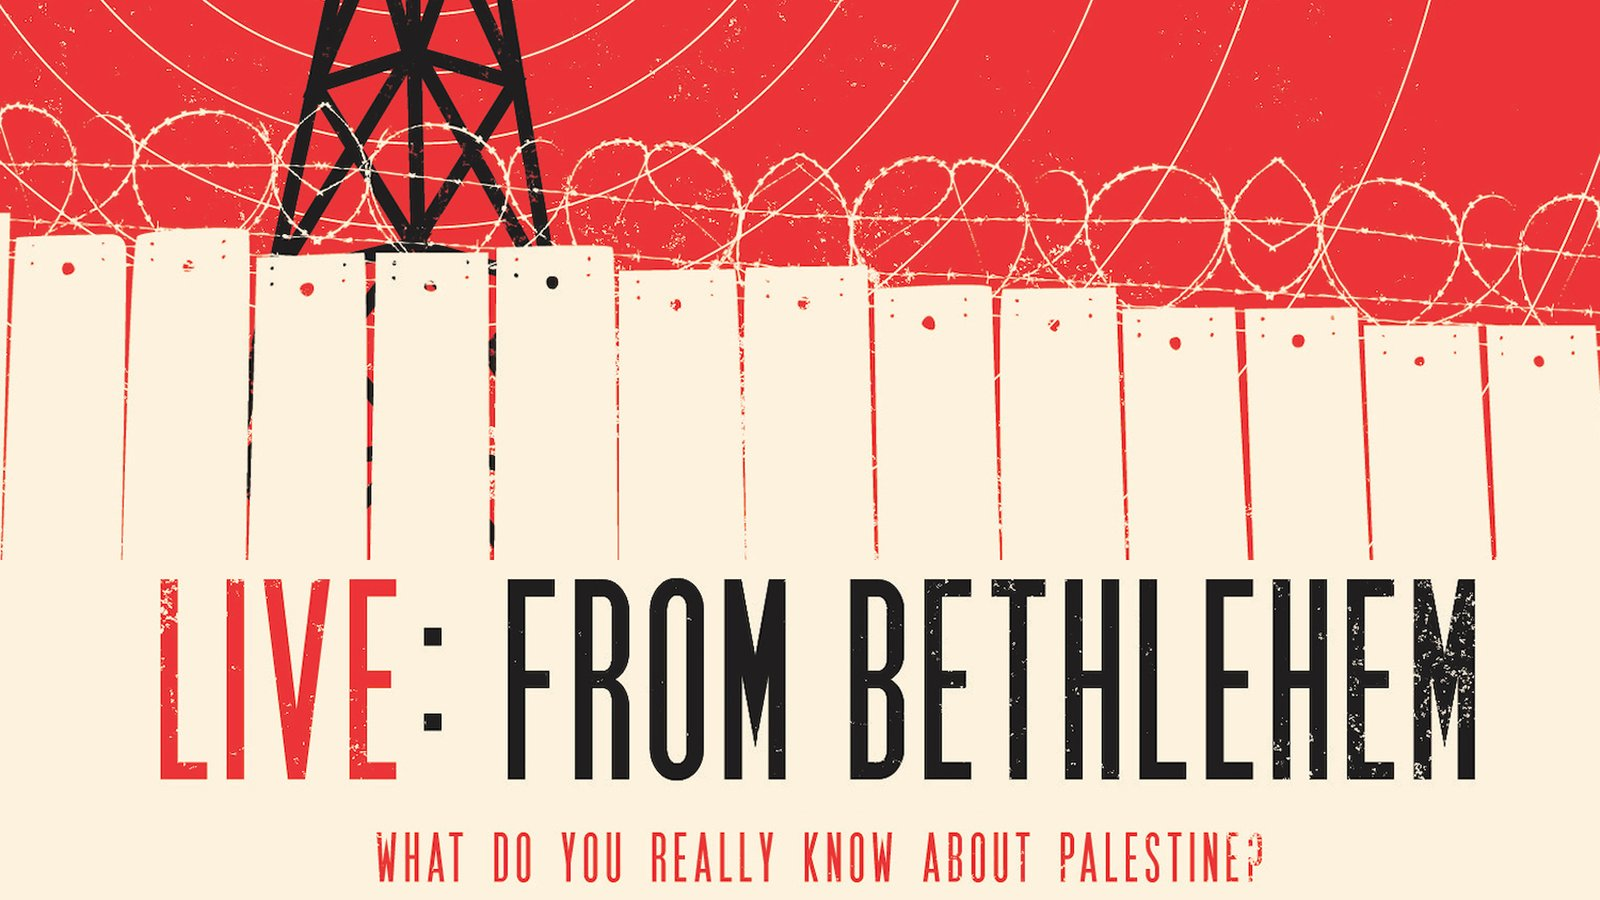 Live From Bethlehem